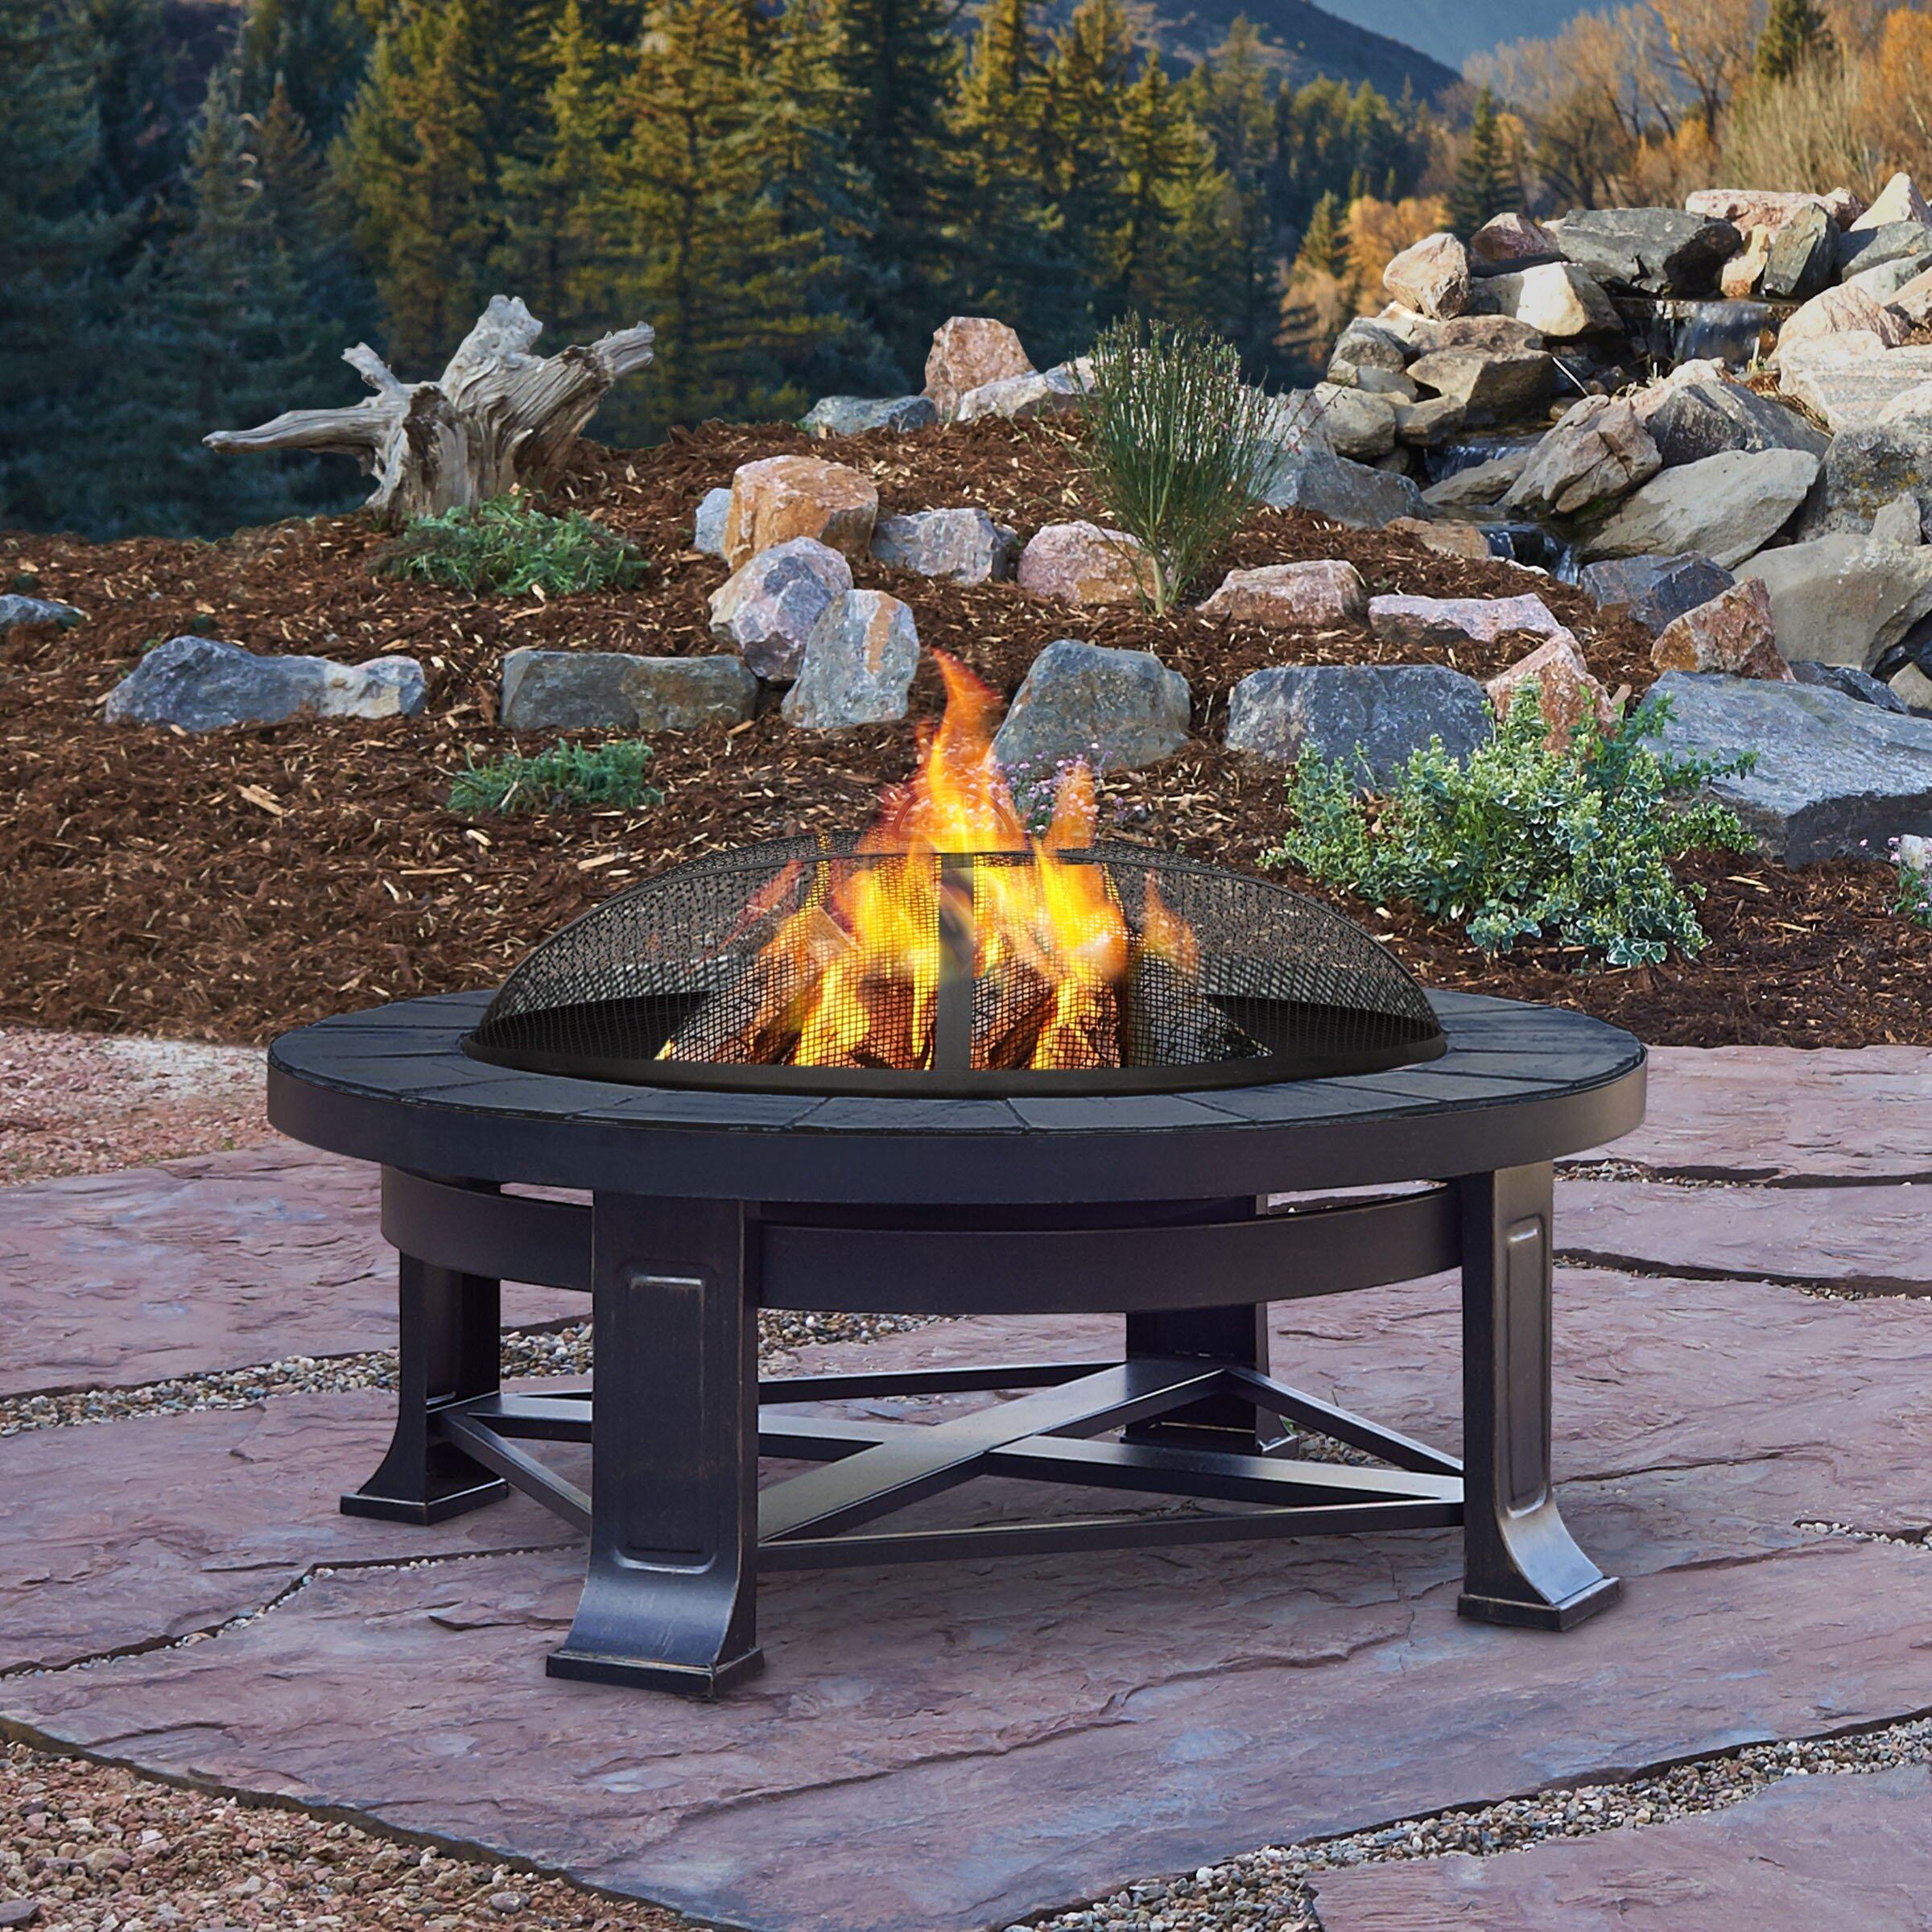 Real Flame Steel Wood Fire Pit Amp Reviews Wayfair Ca